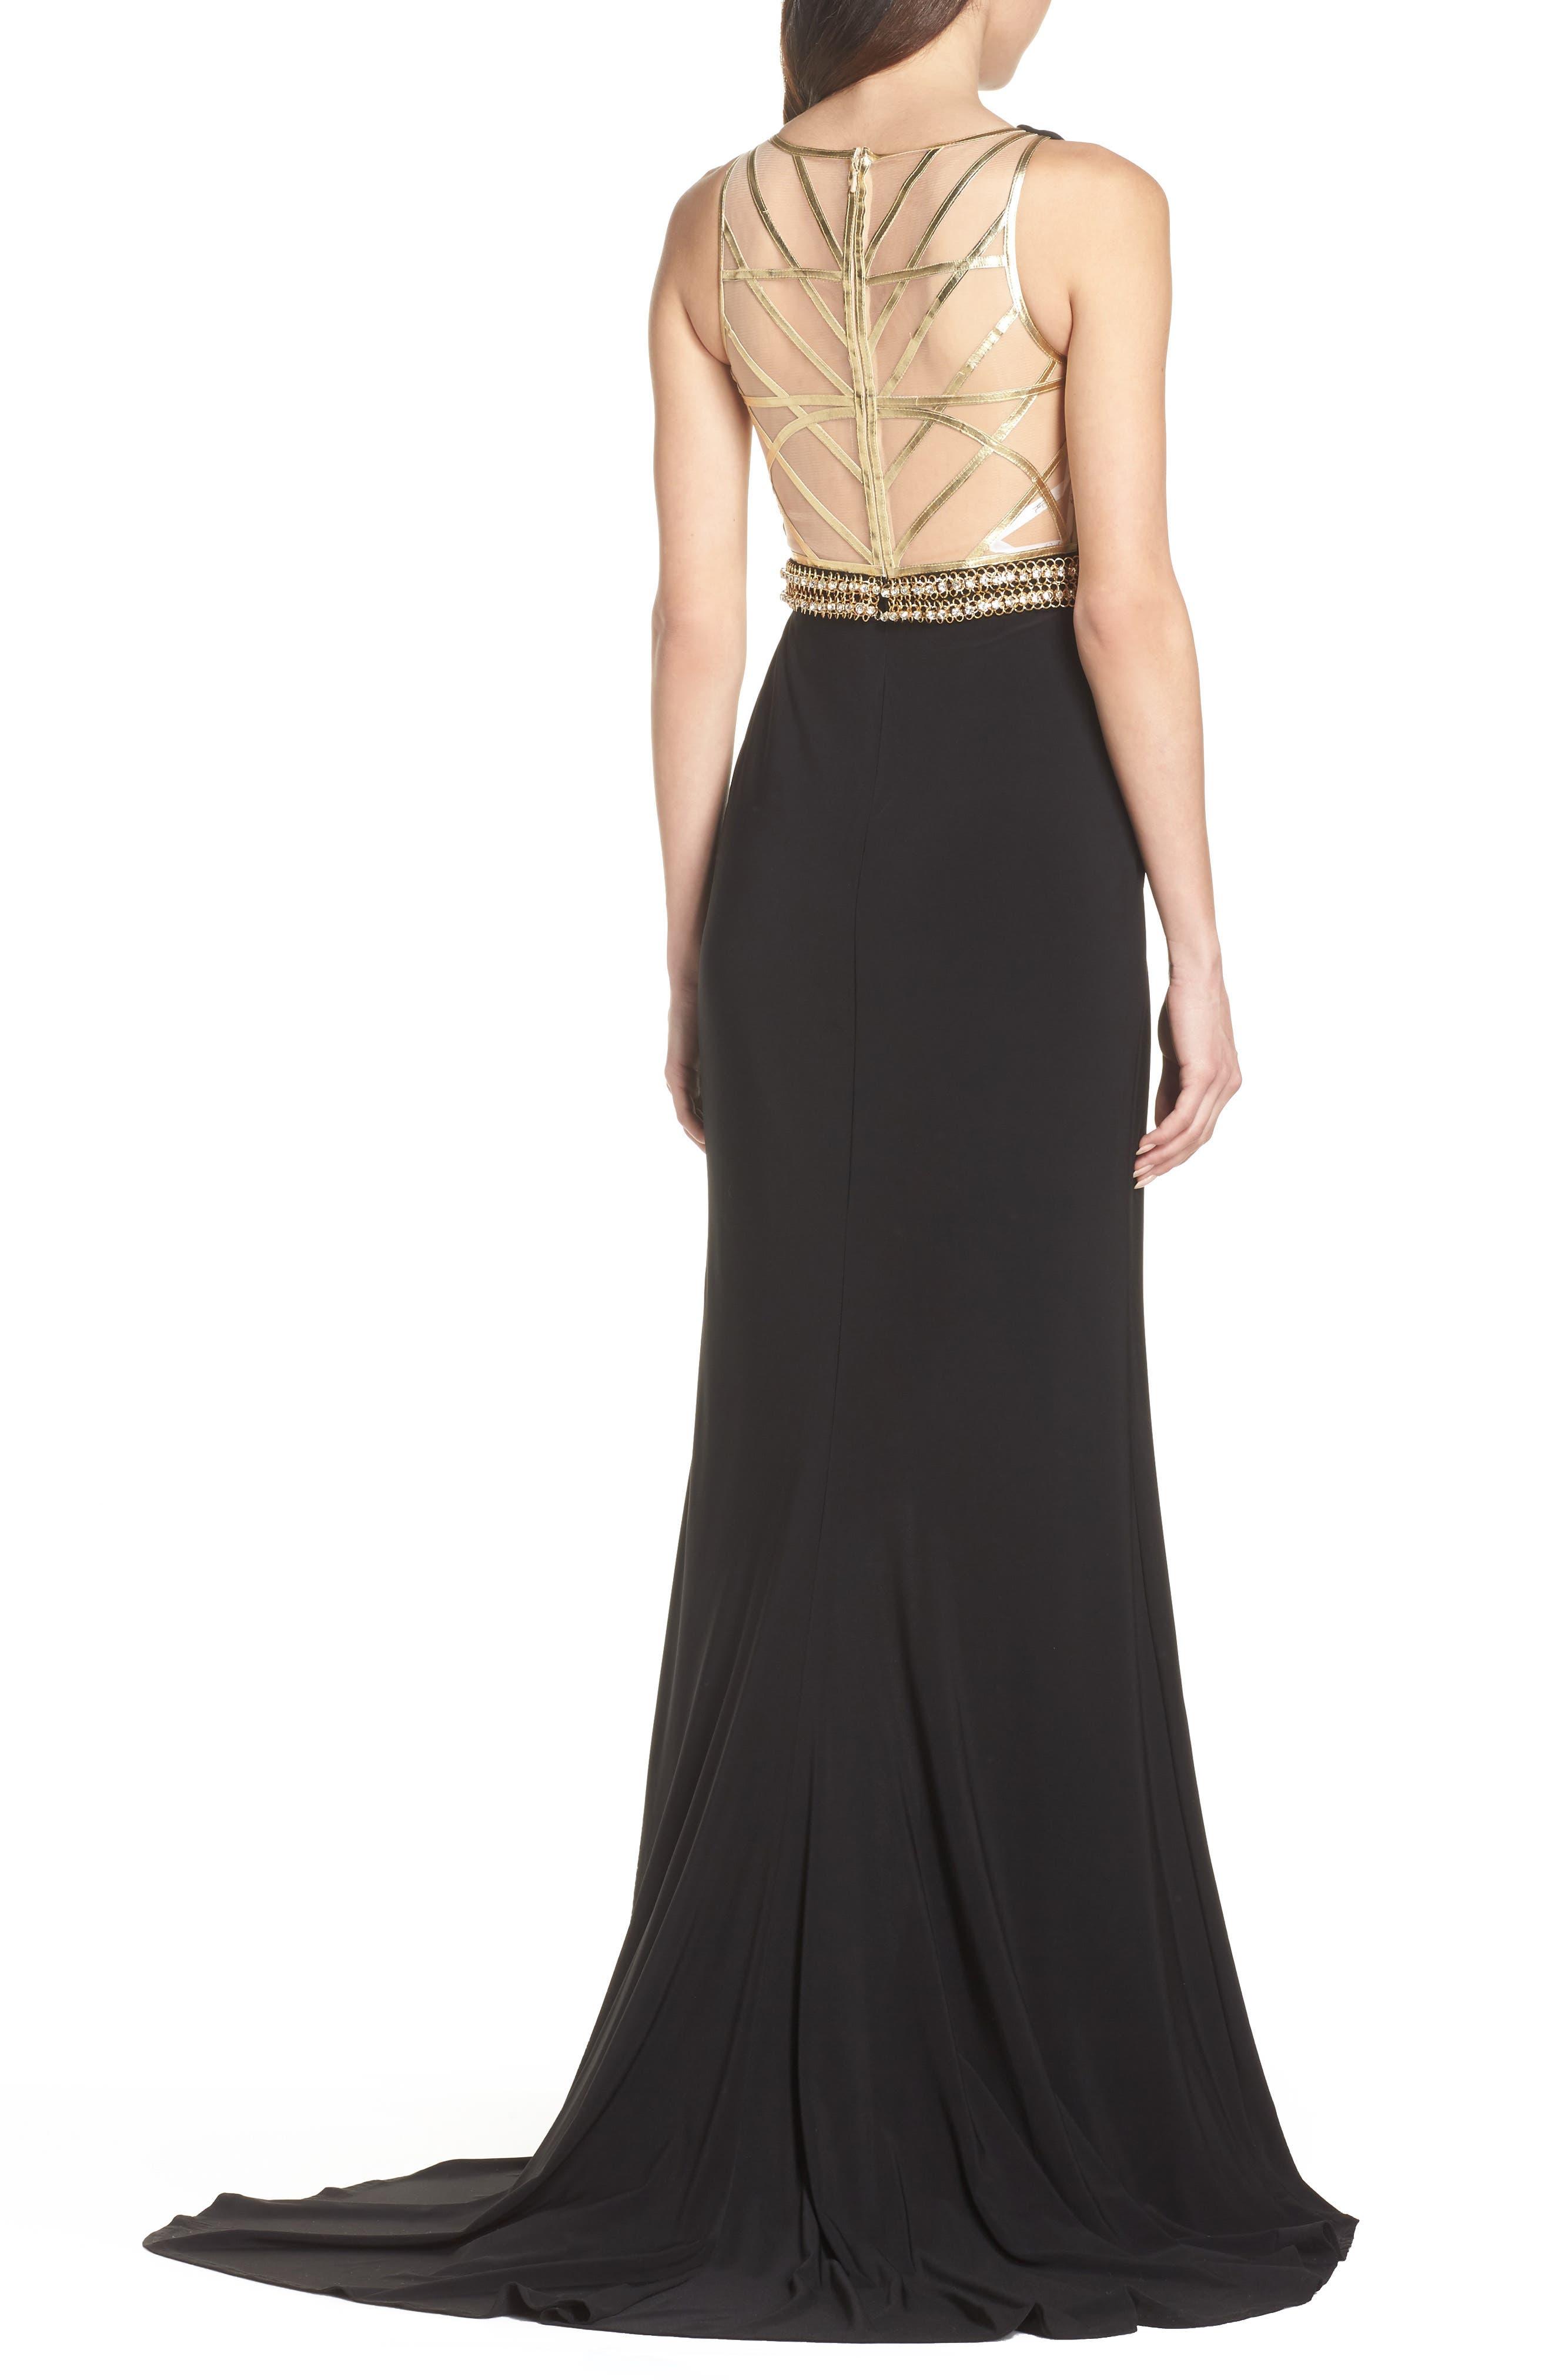 MAC DUGGAL, Embellished Waist Gown, Alternate thumbnail 2, color, BLACK